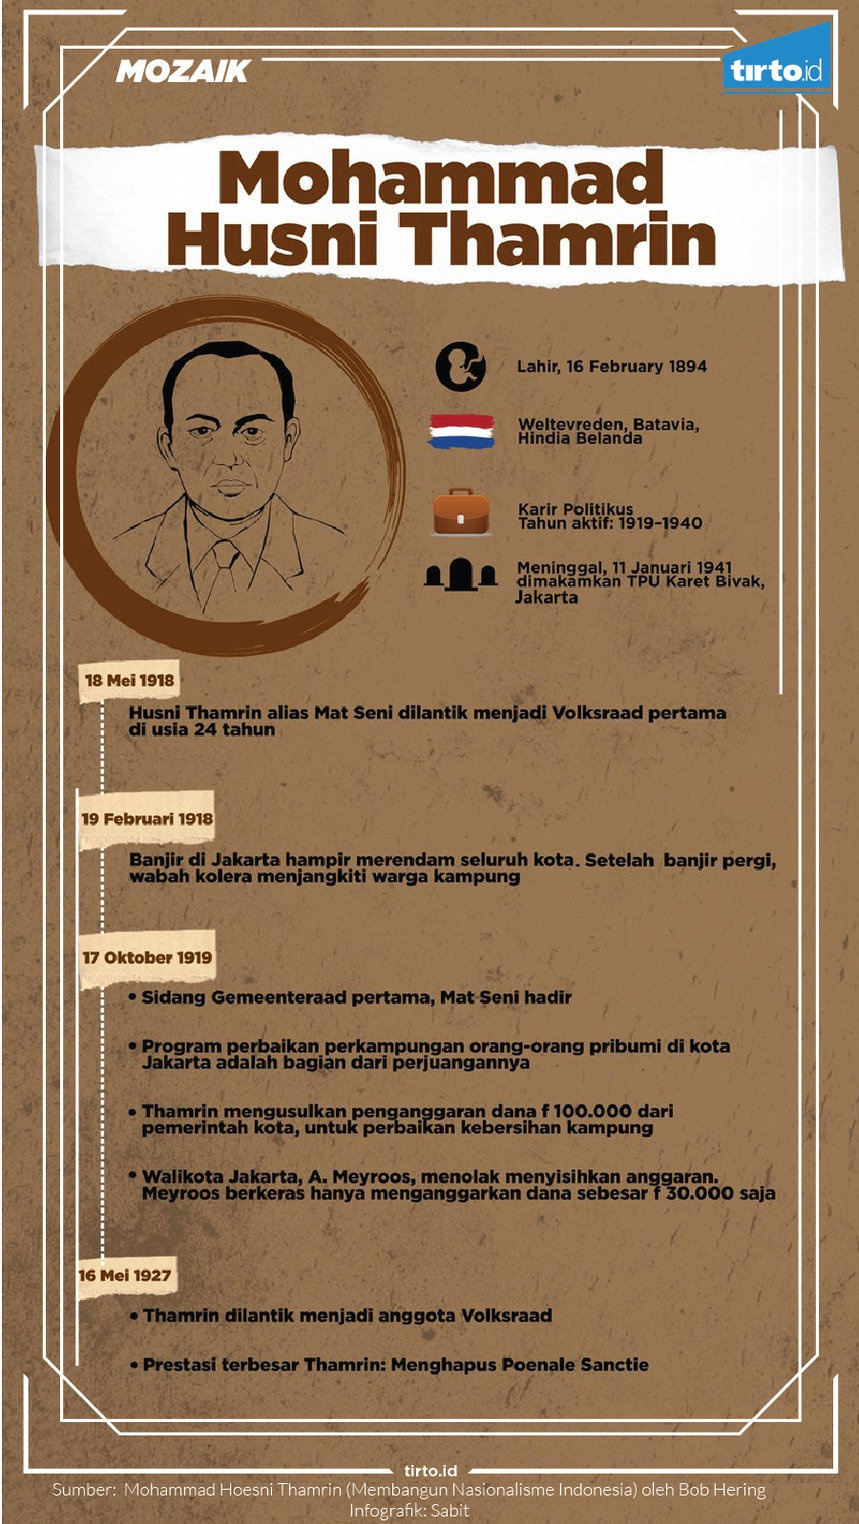 Husni Thamrin, Pahlawan Betawi yang Berjuang di Volksraad